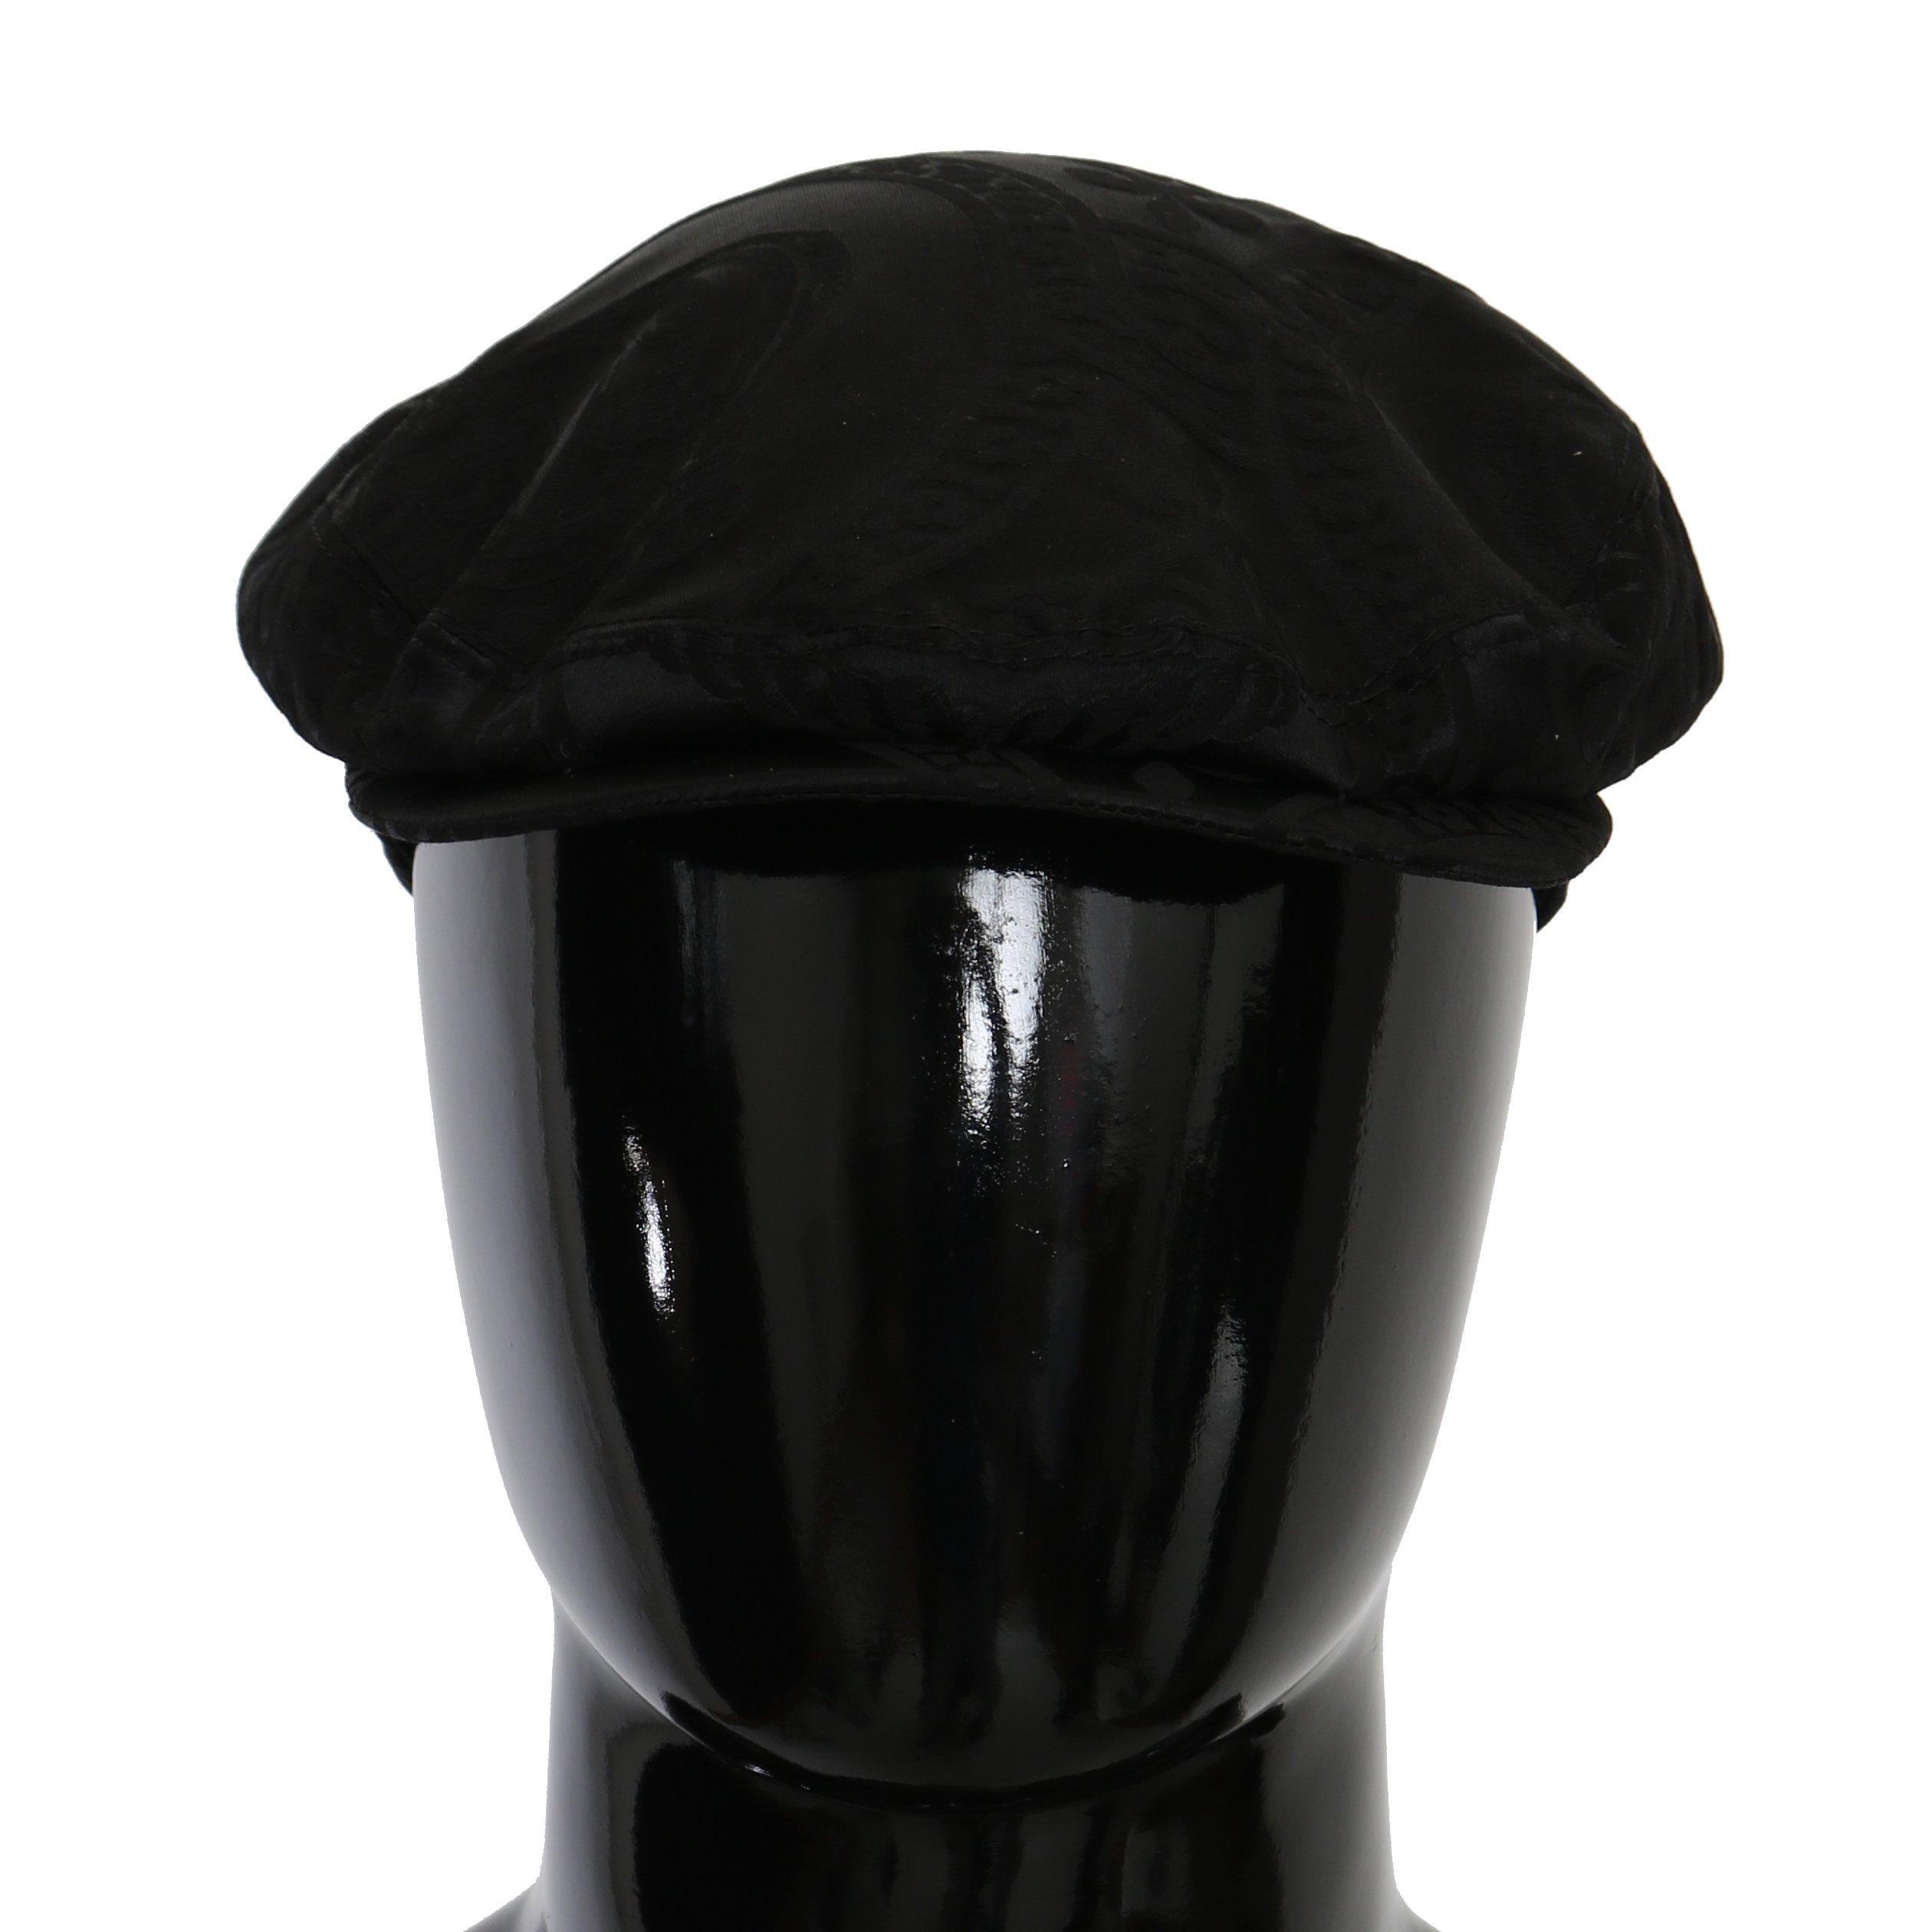 Dolce & Gabbana Men's Brocade Casual Hat Black HAT9067 - 59 cm|L